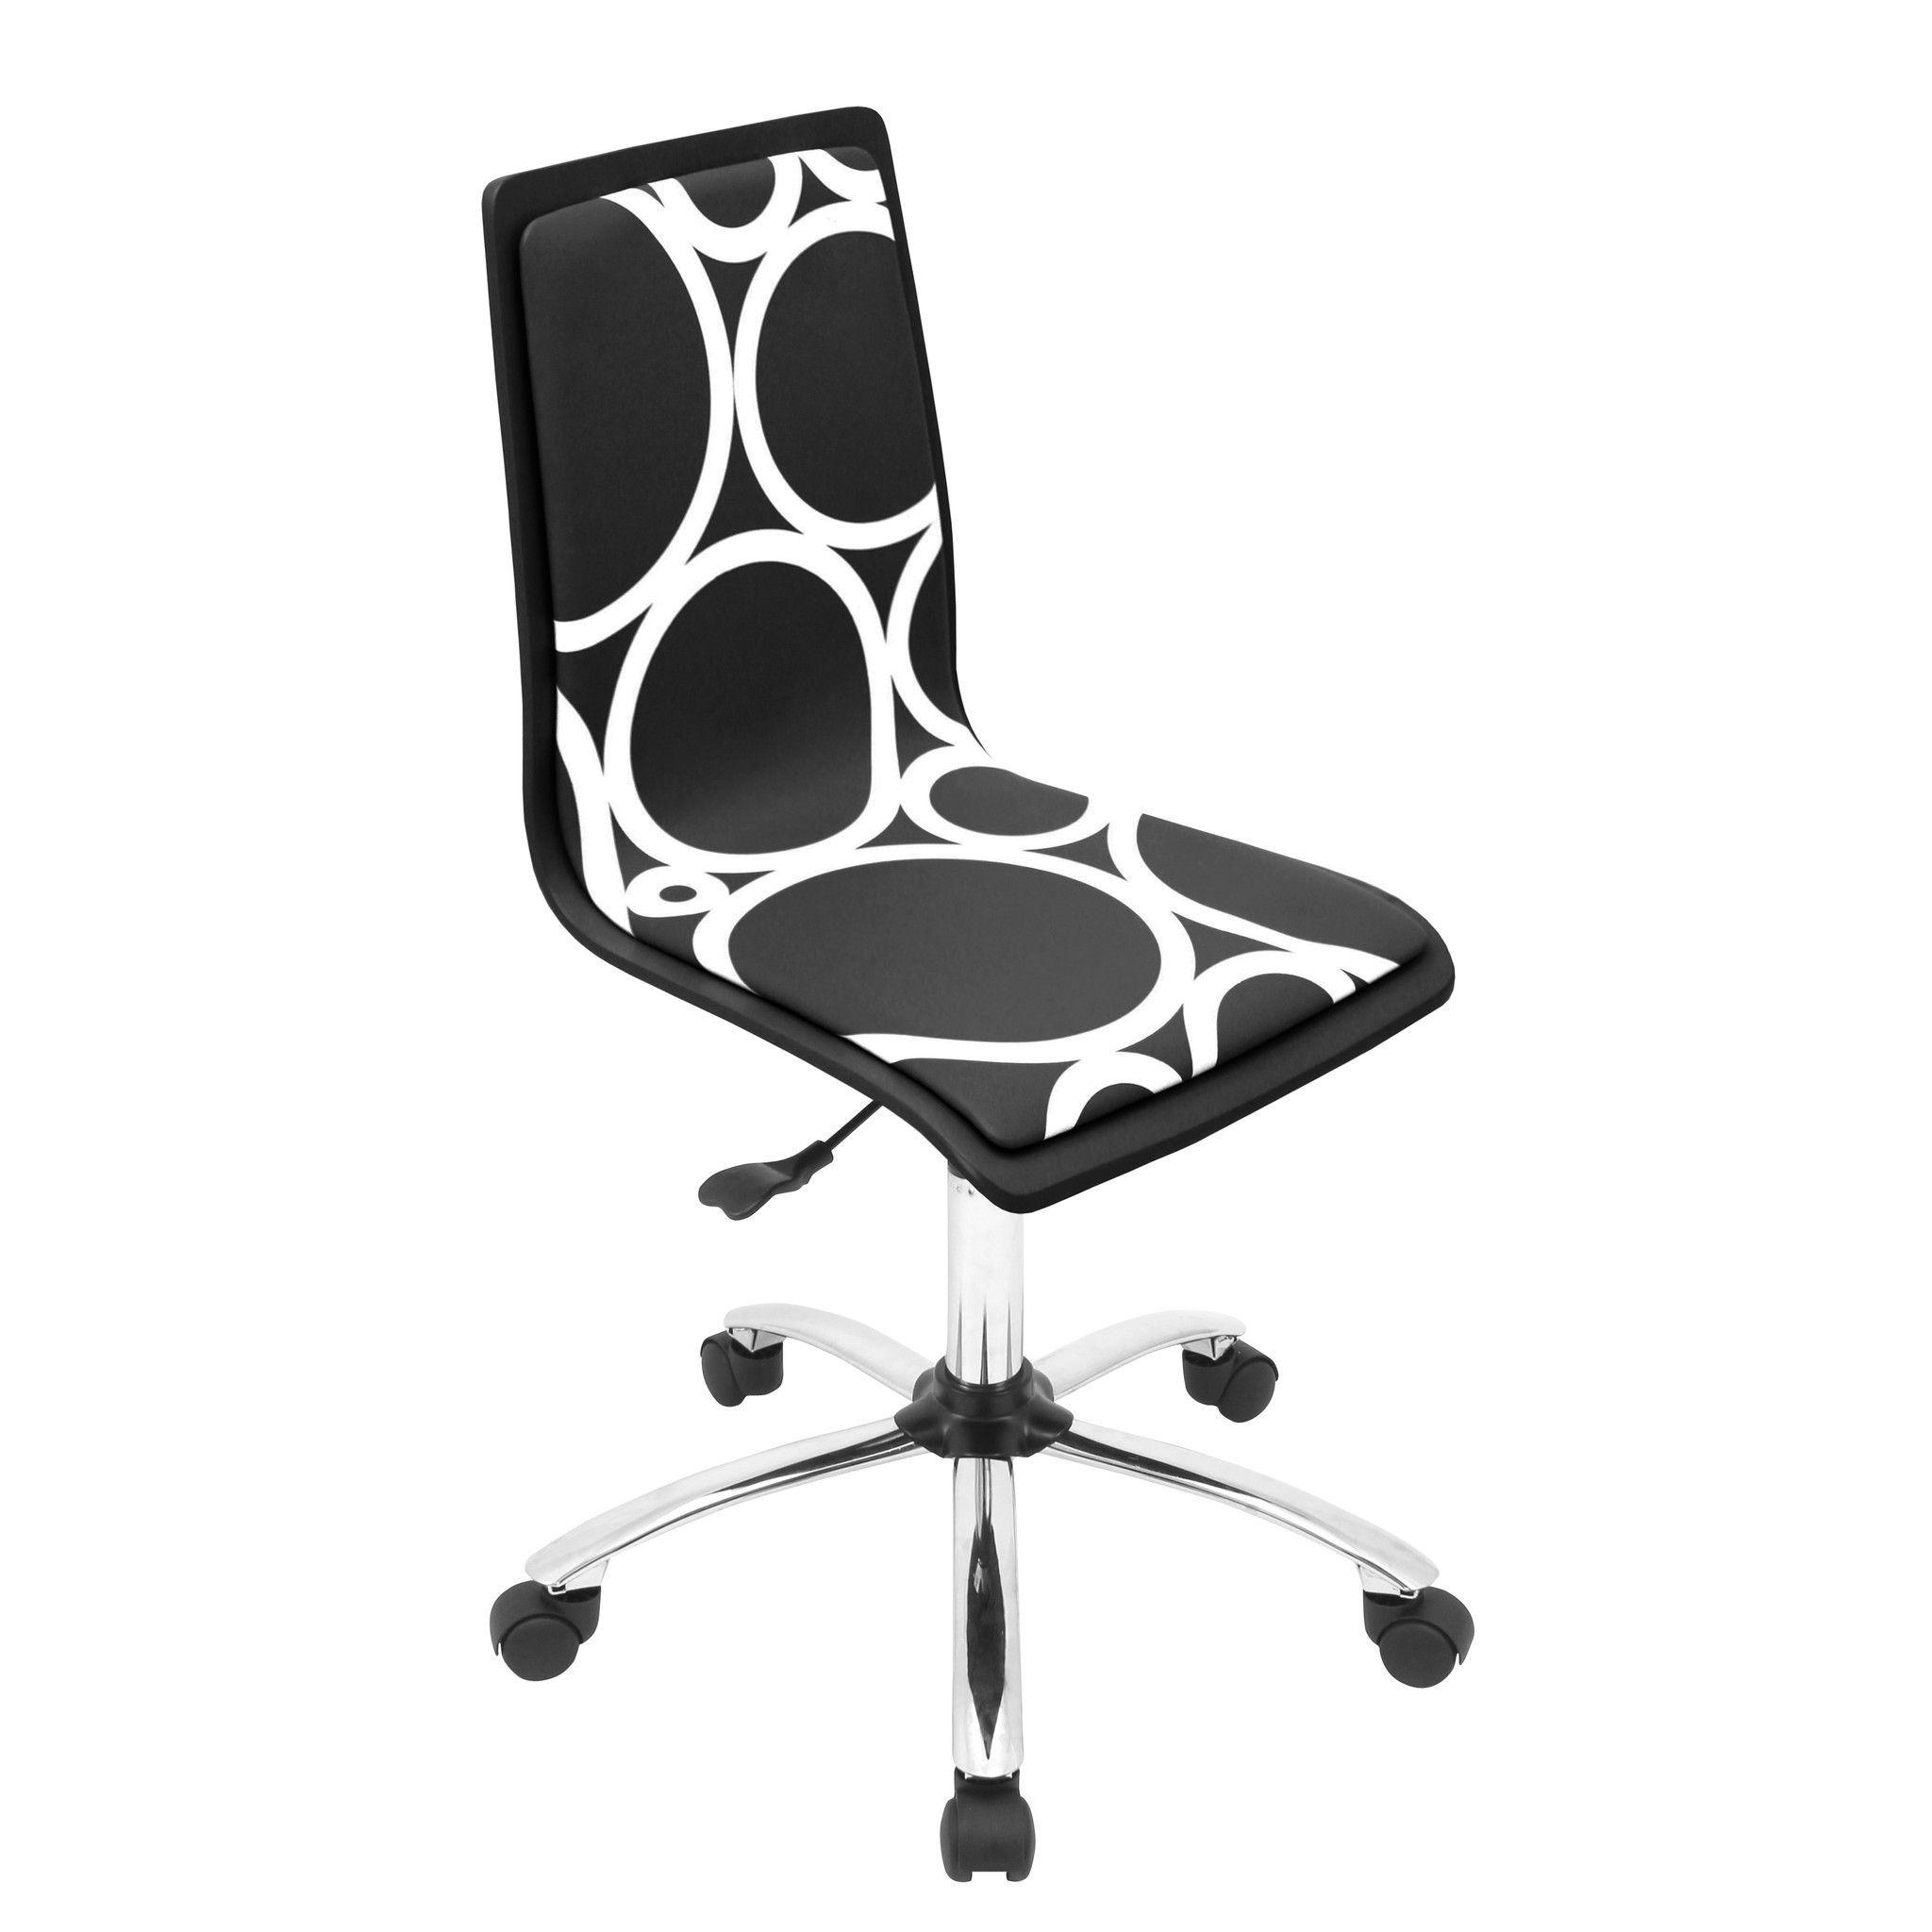 Printed Office Chair Black Circles